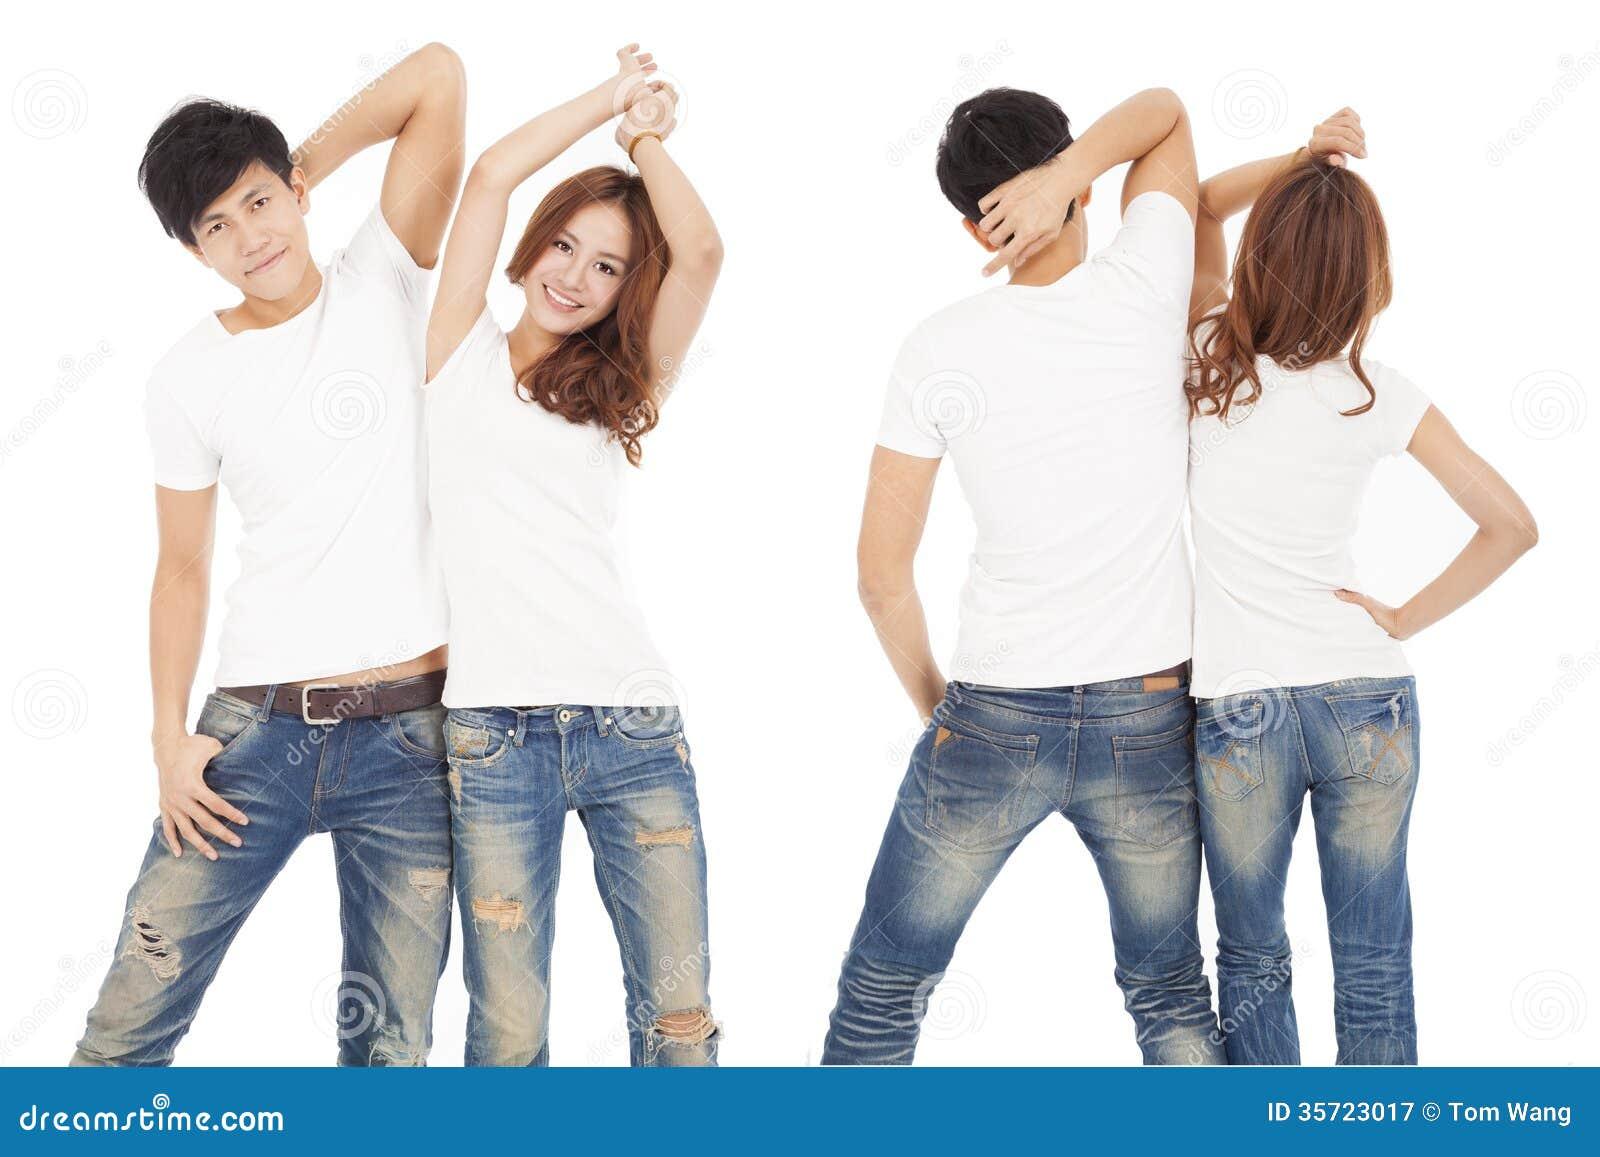 Couple Shirts Design Templates